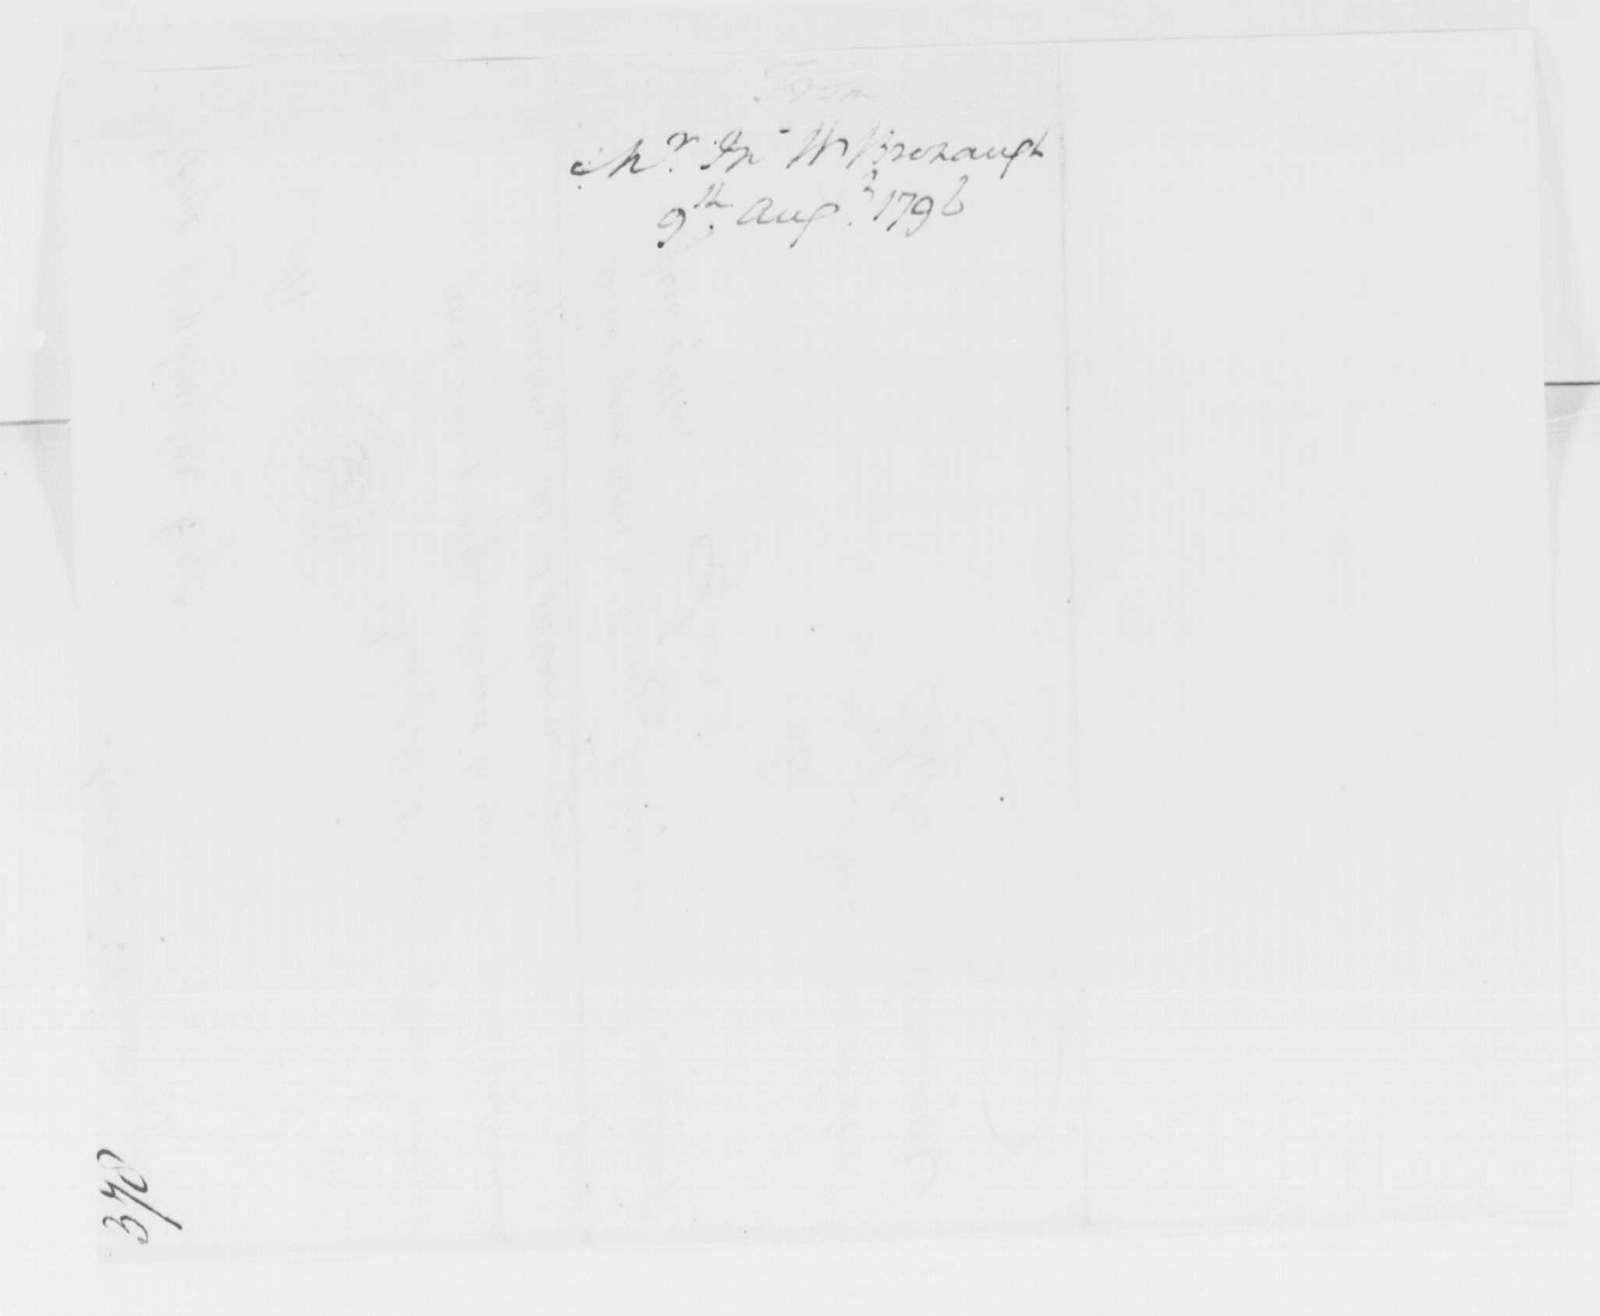 George Washington Papers, Series 4, General Correspondence: John W. Bronaugh to George Washington, August 9, 1796